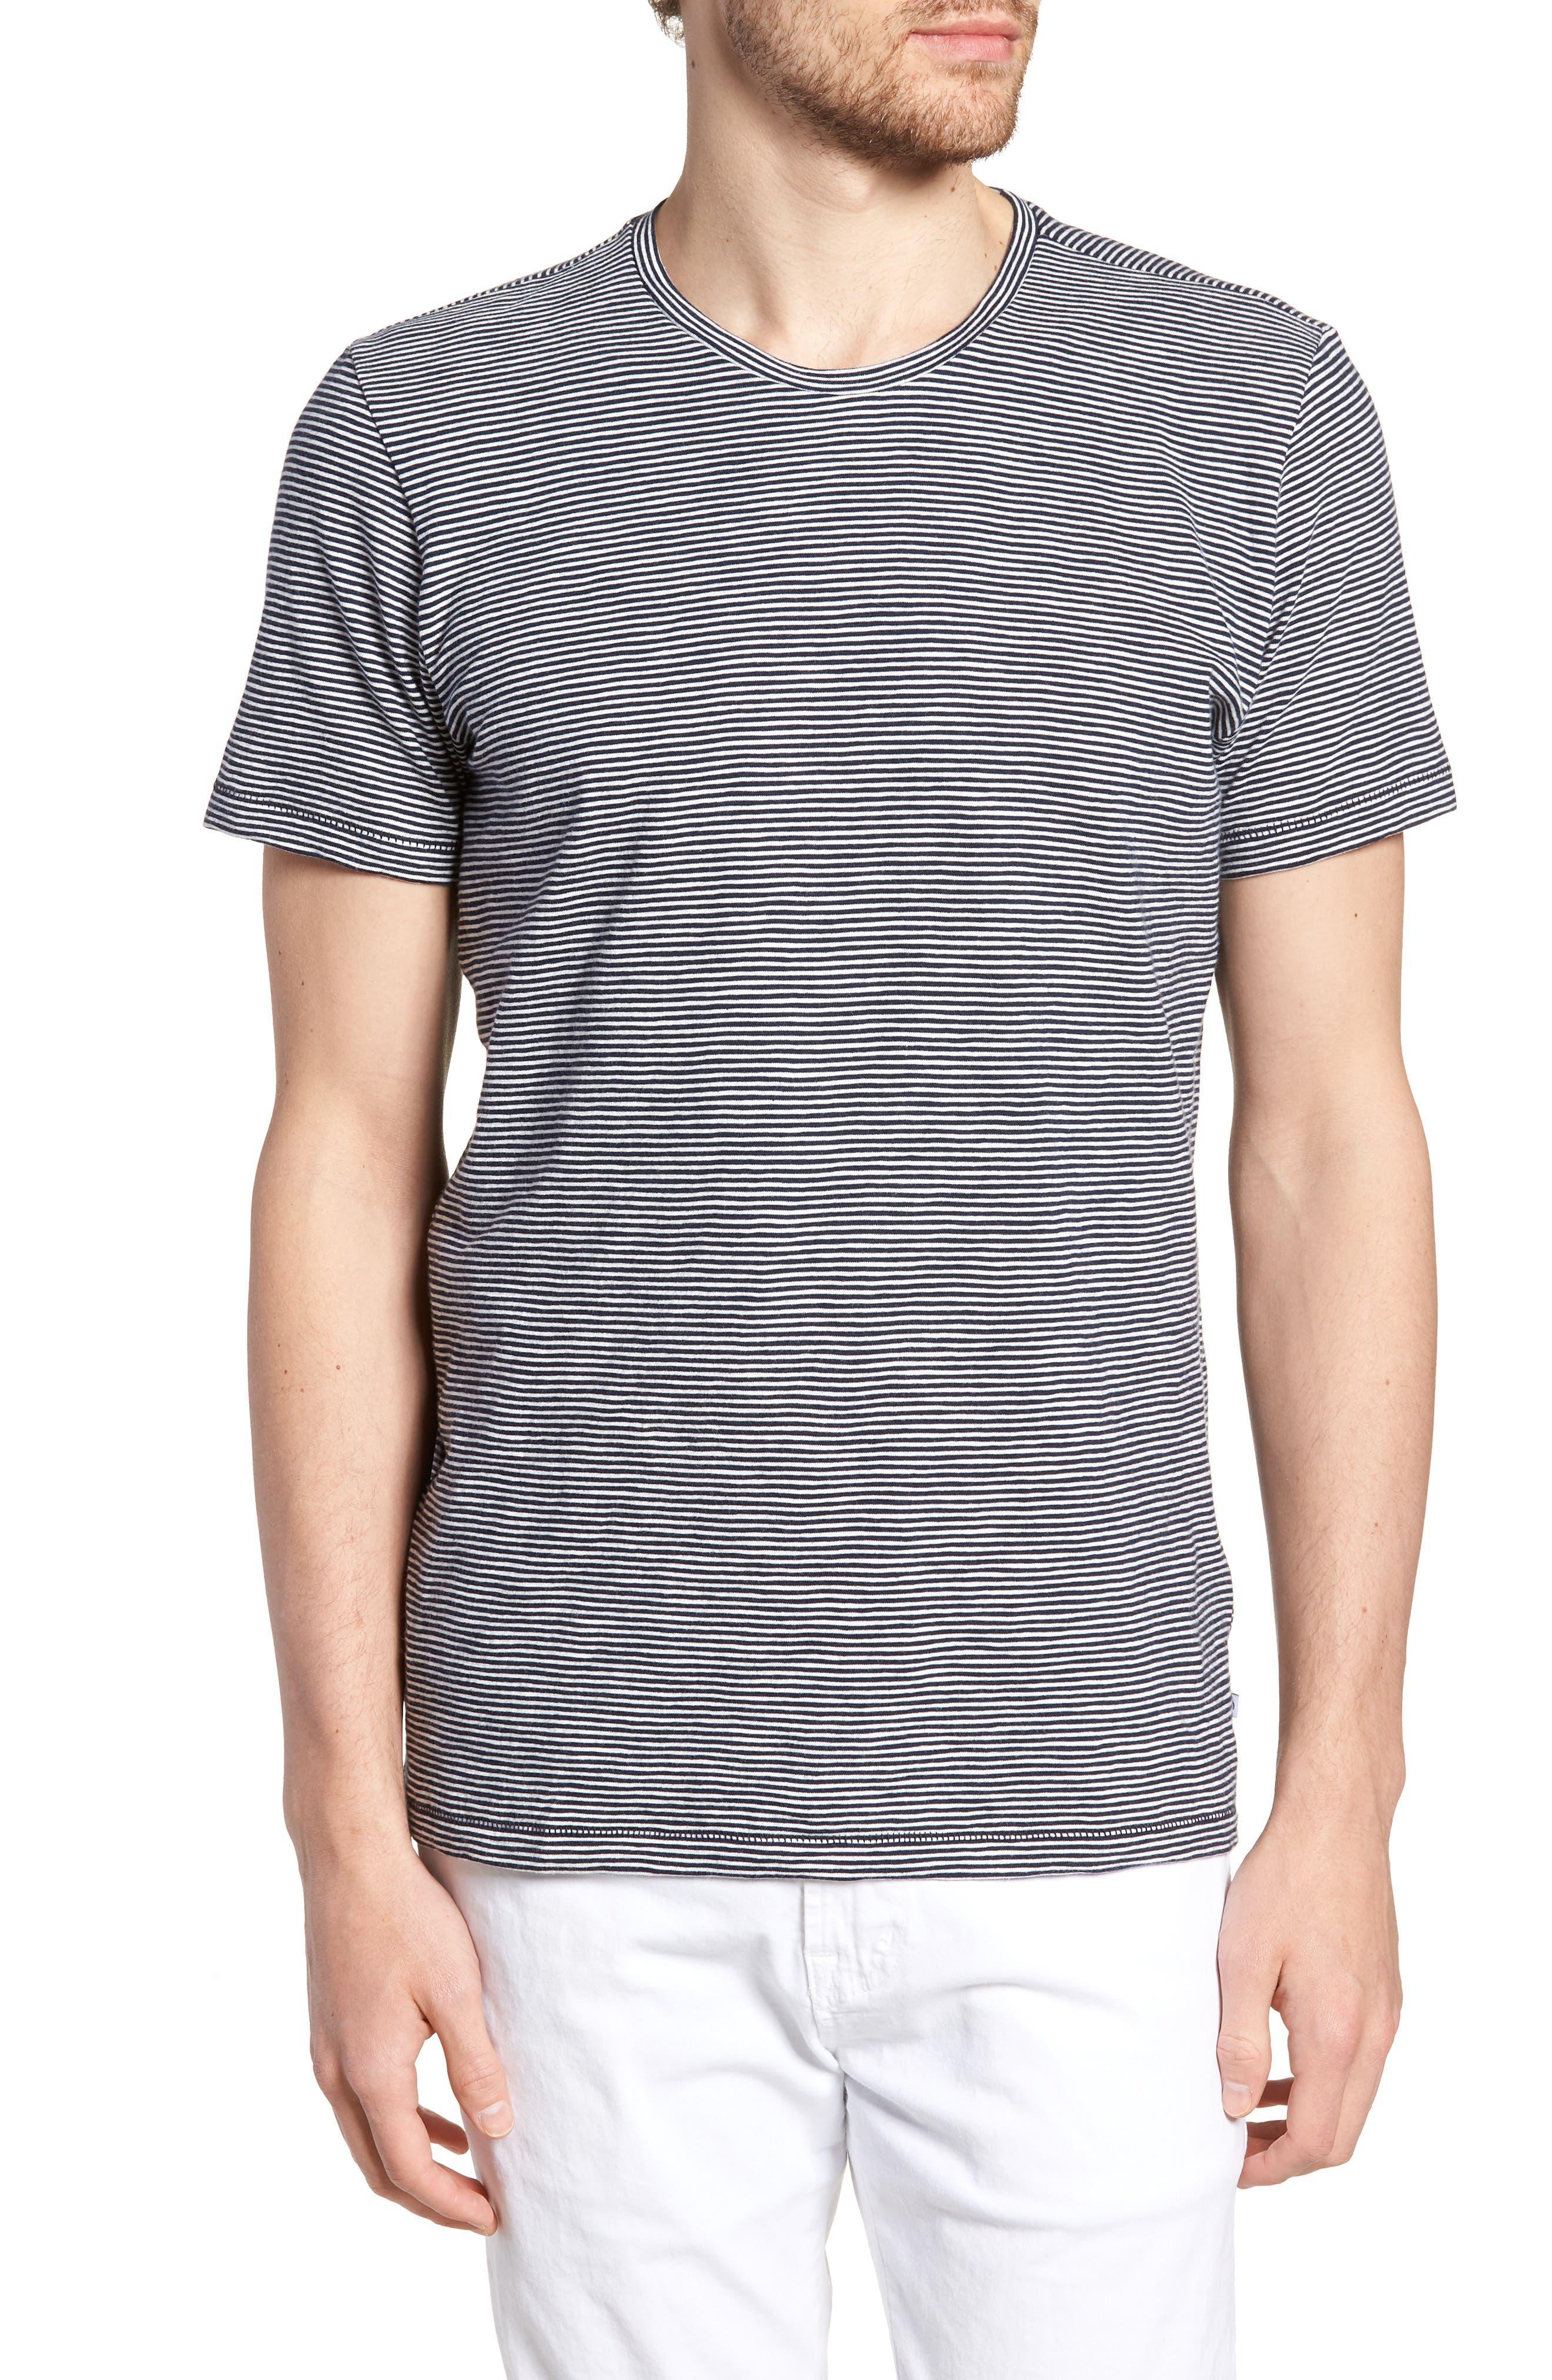 Stripe T-Shirt,                             Main thumbnail 1, color,                             Paddleboard Stripe Tee